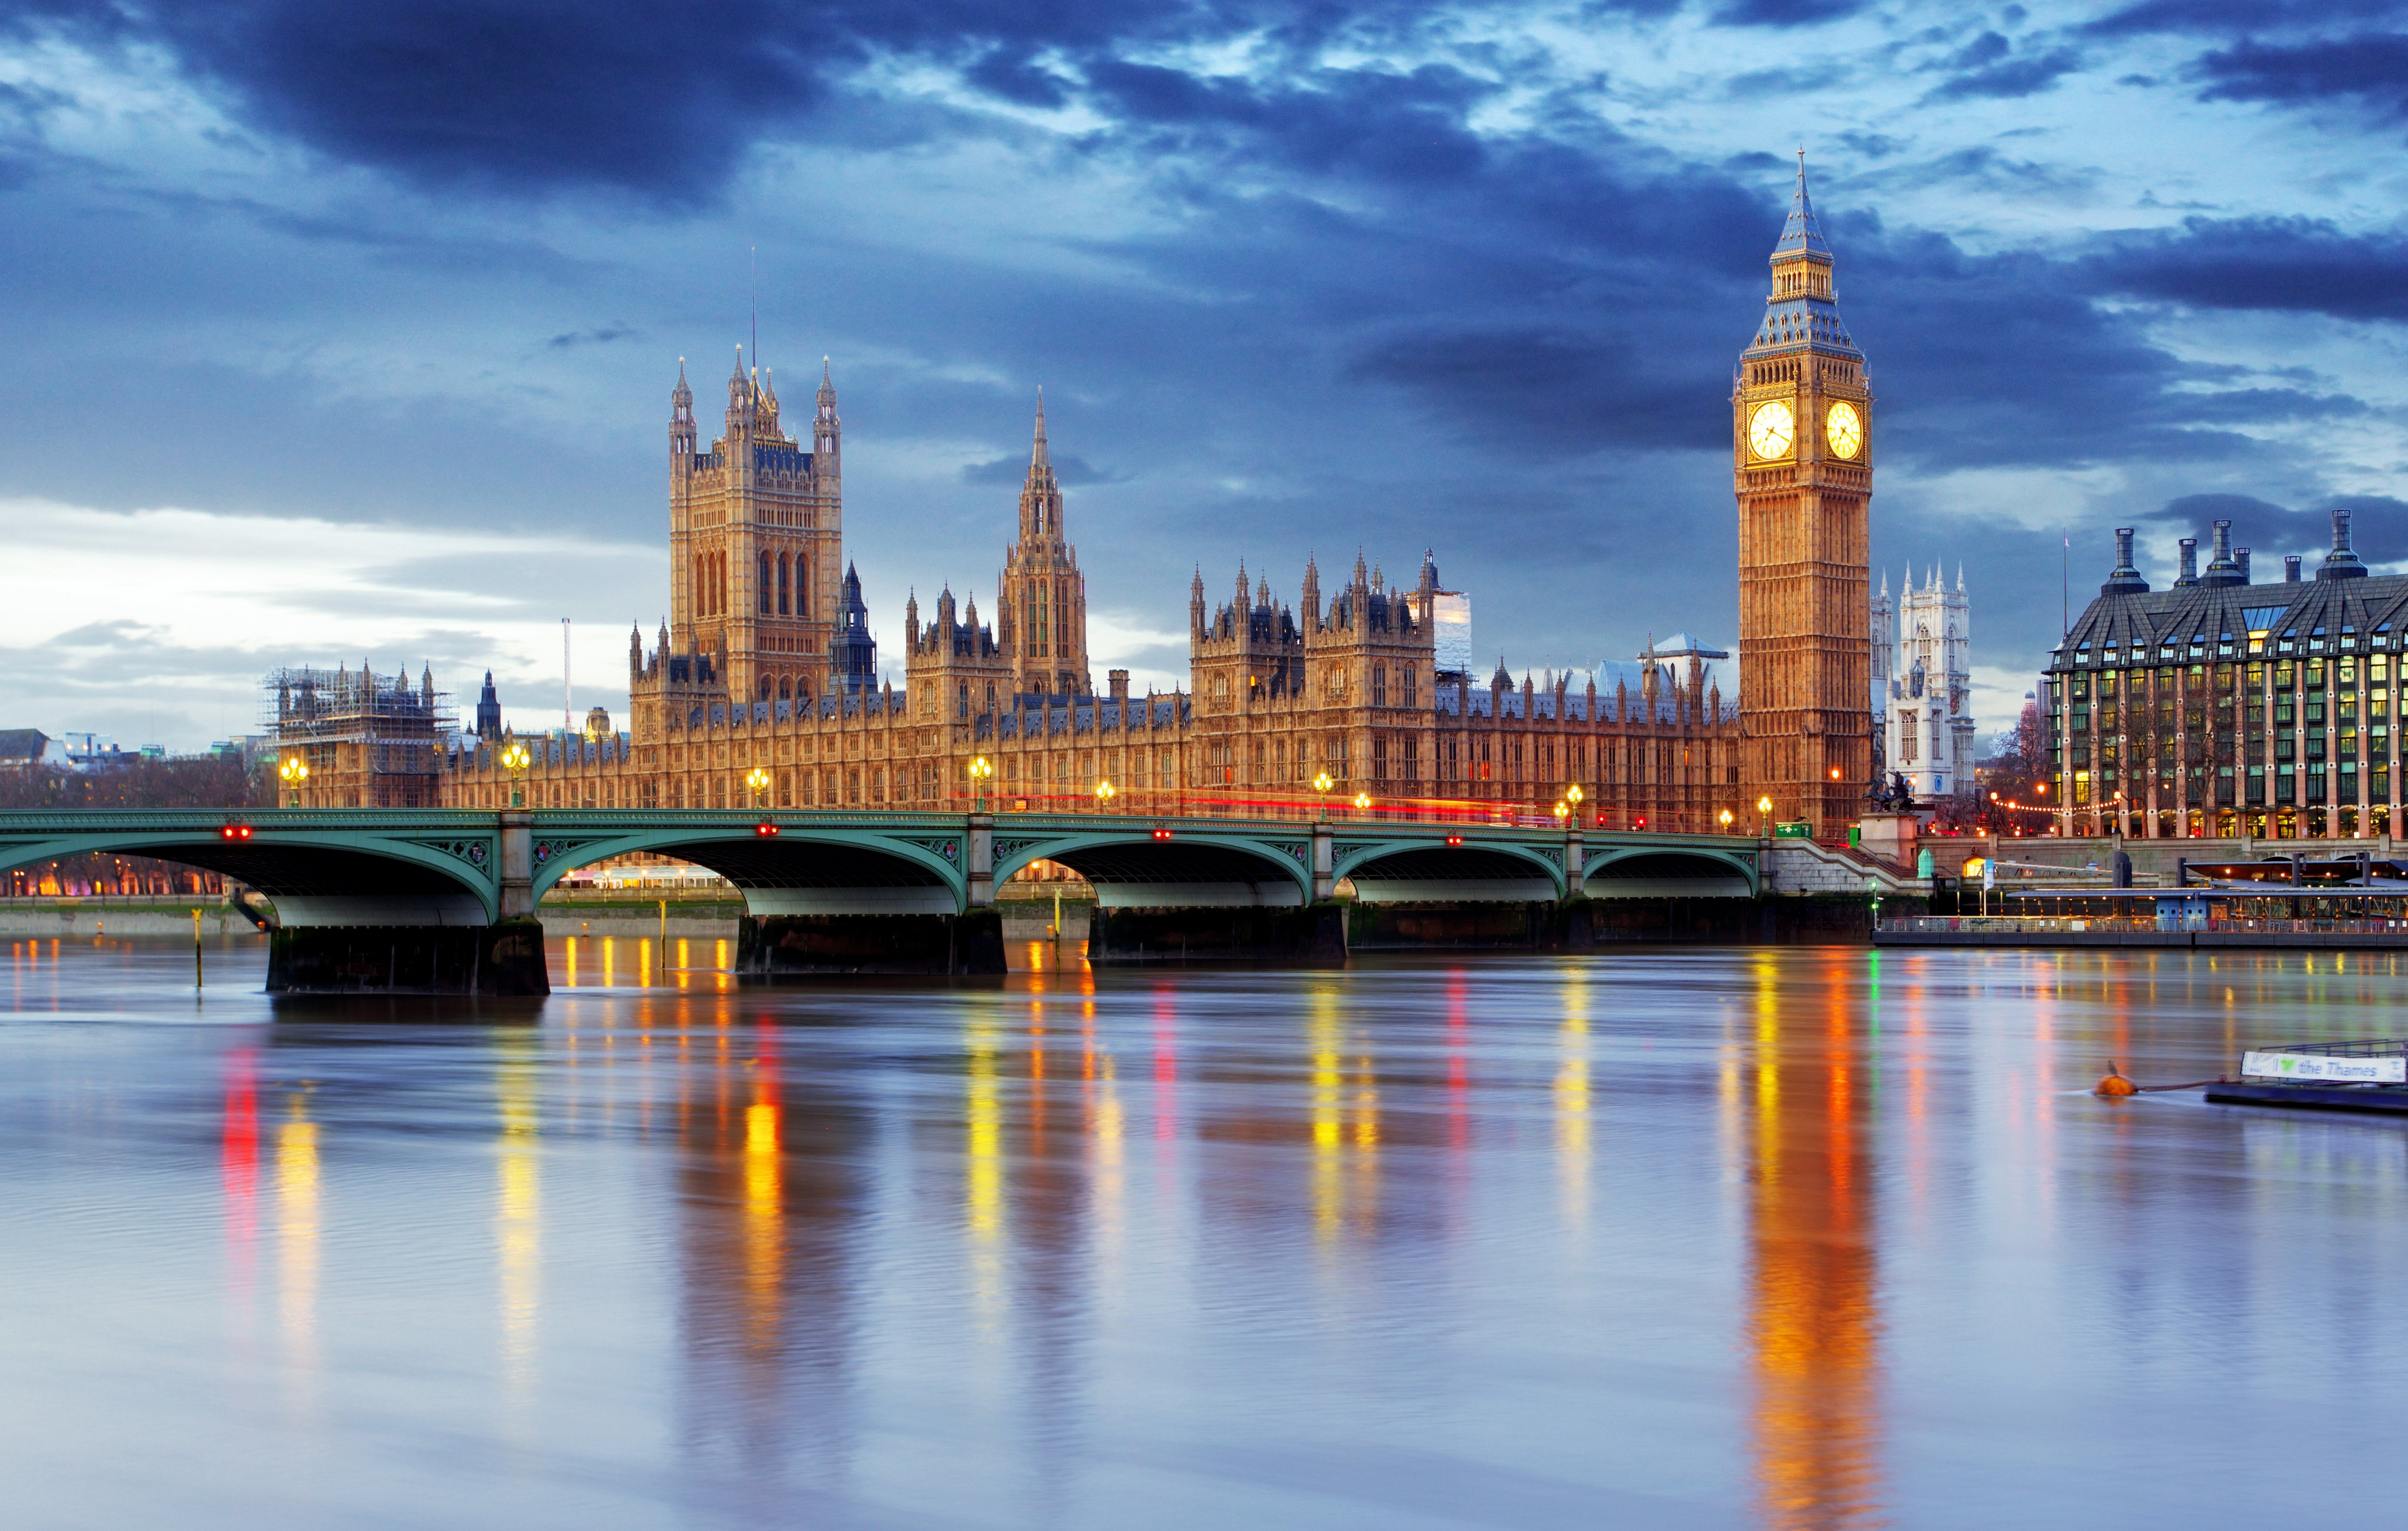 Rivers Bridges Houses Sky London Big Ben Cities wallpaper background 5600x3560